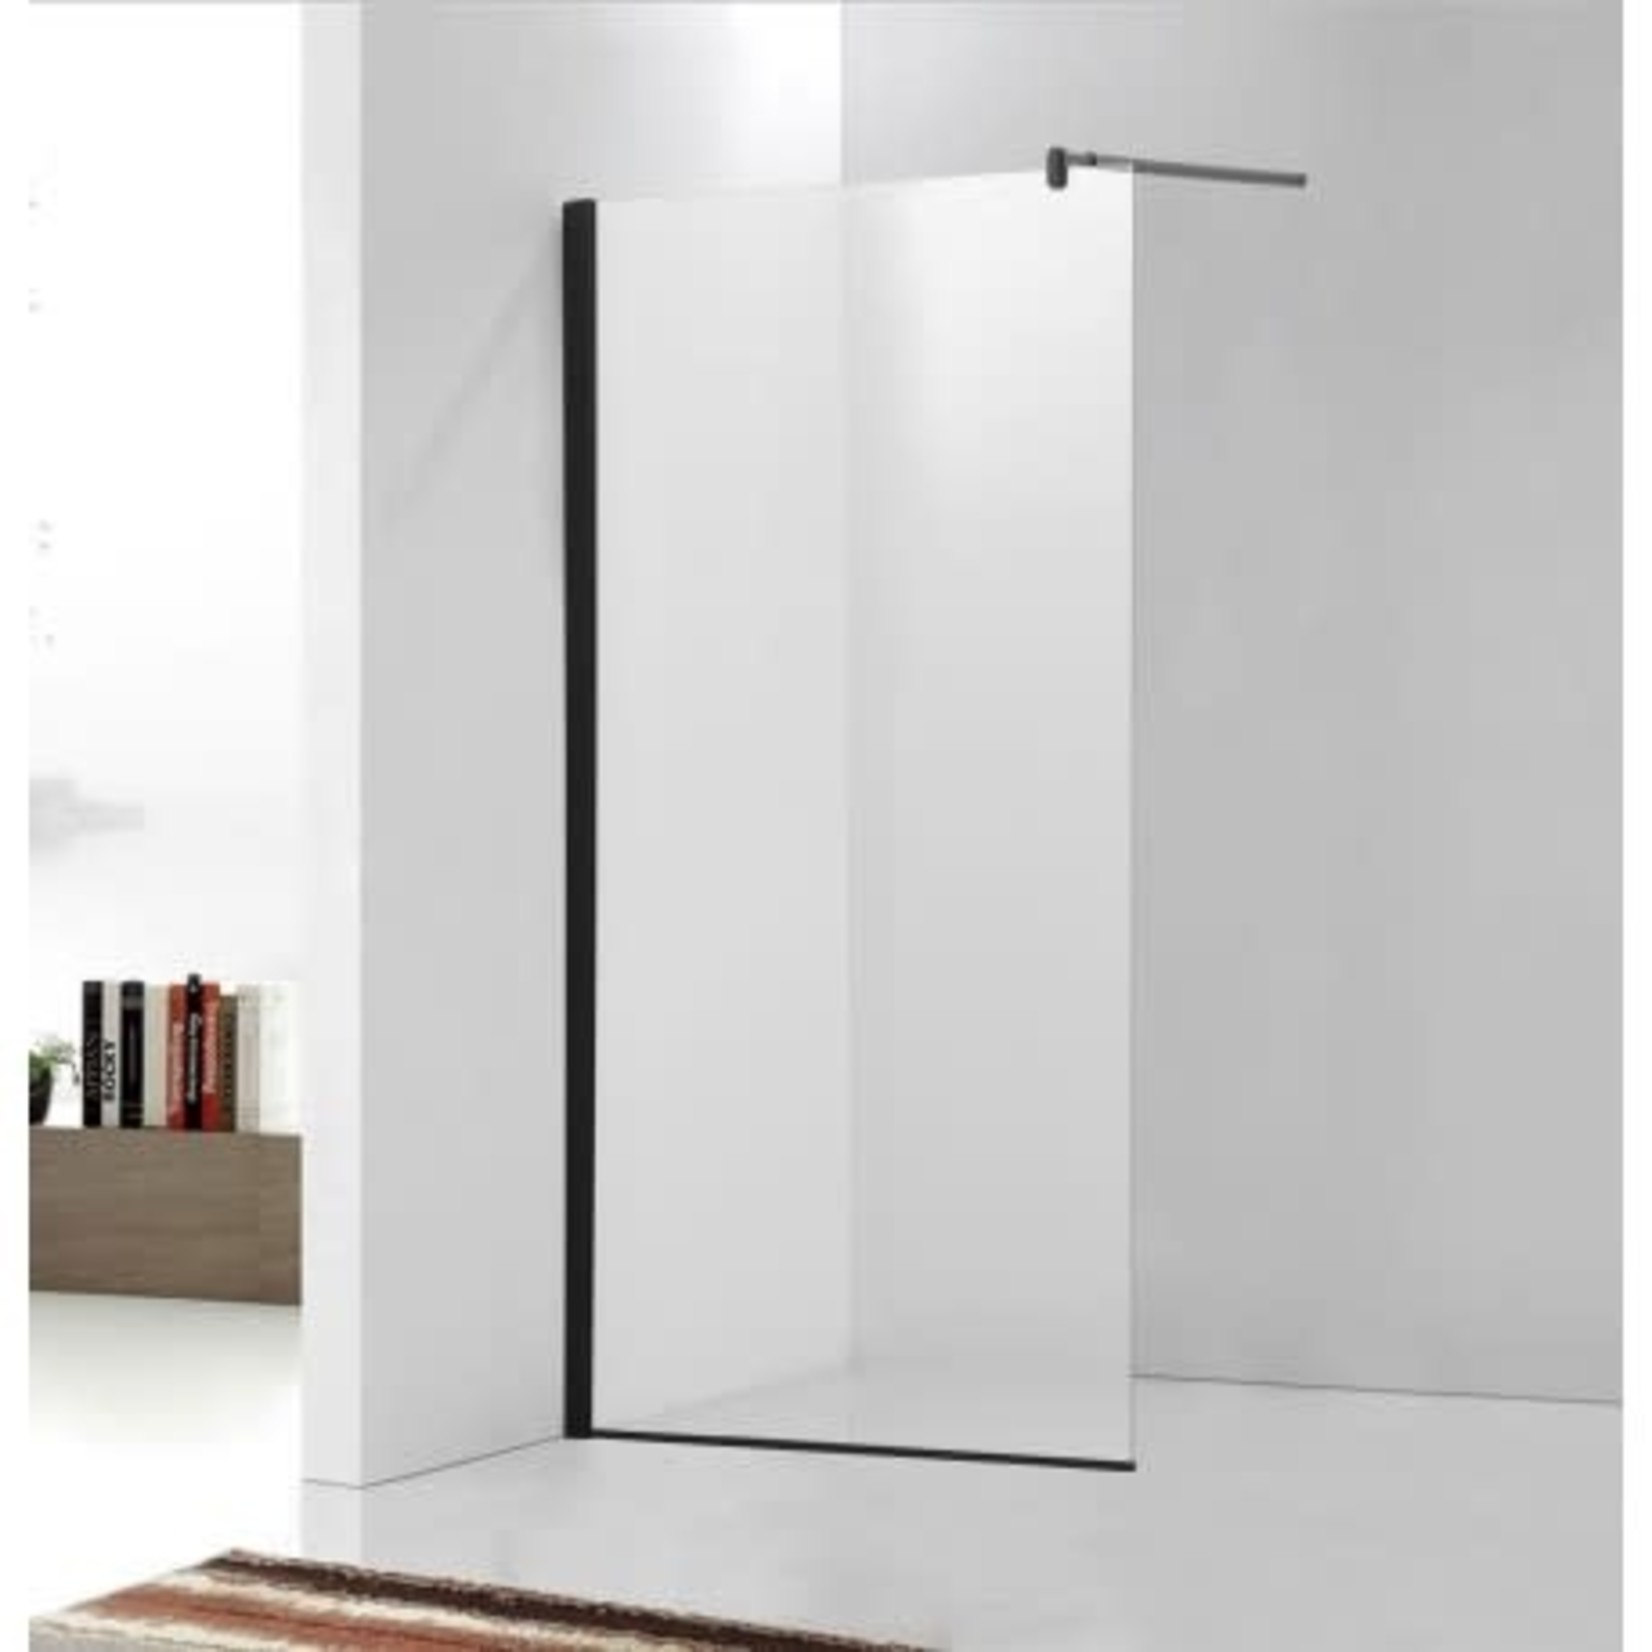 60 '' Matte Black Italian style glass shower